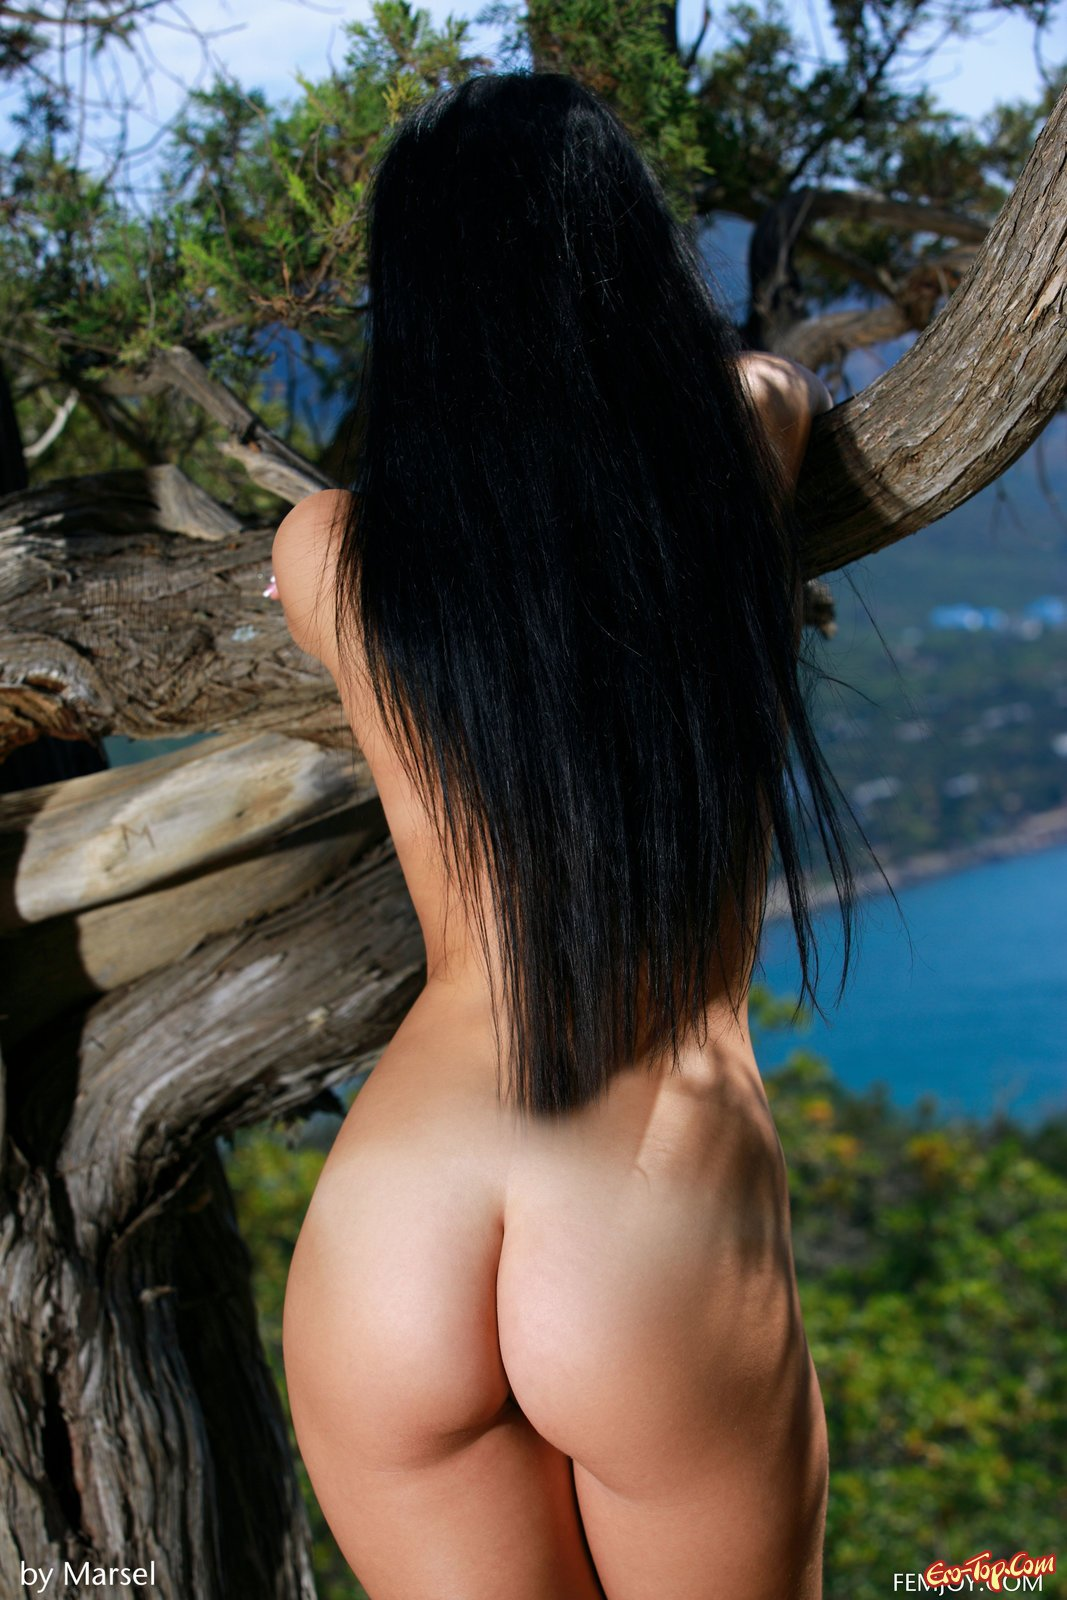 фото голых брюнеток сзади - 10